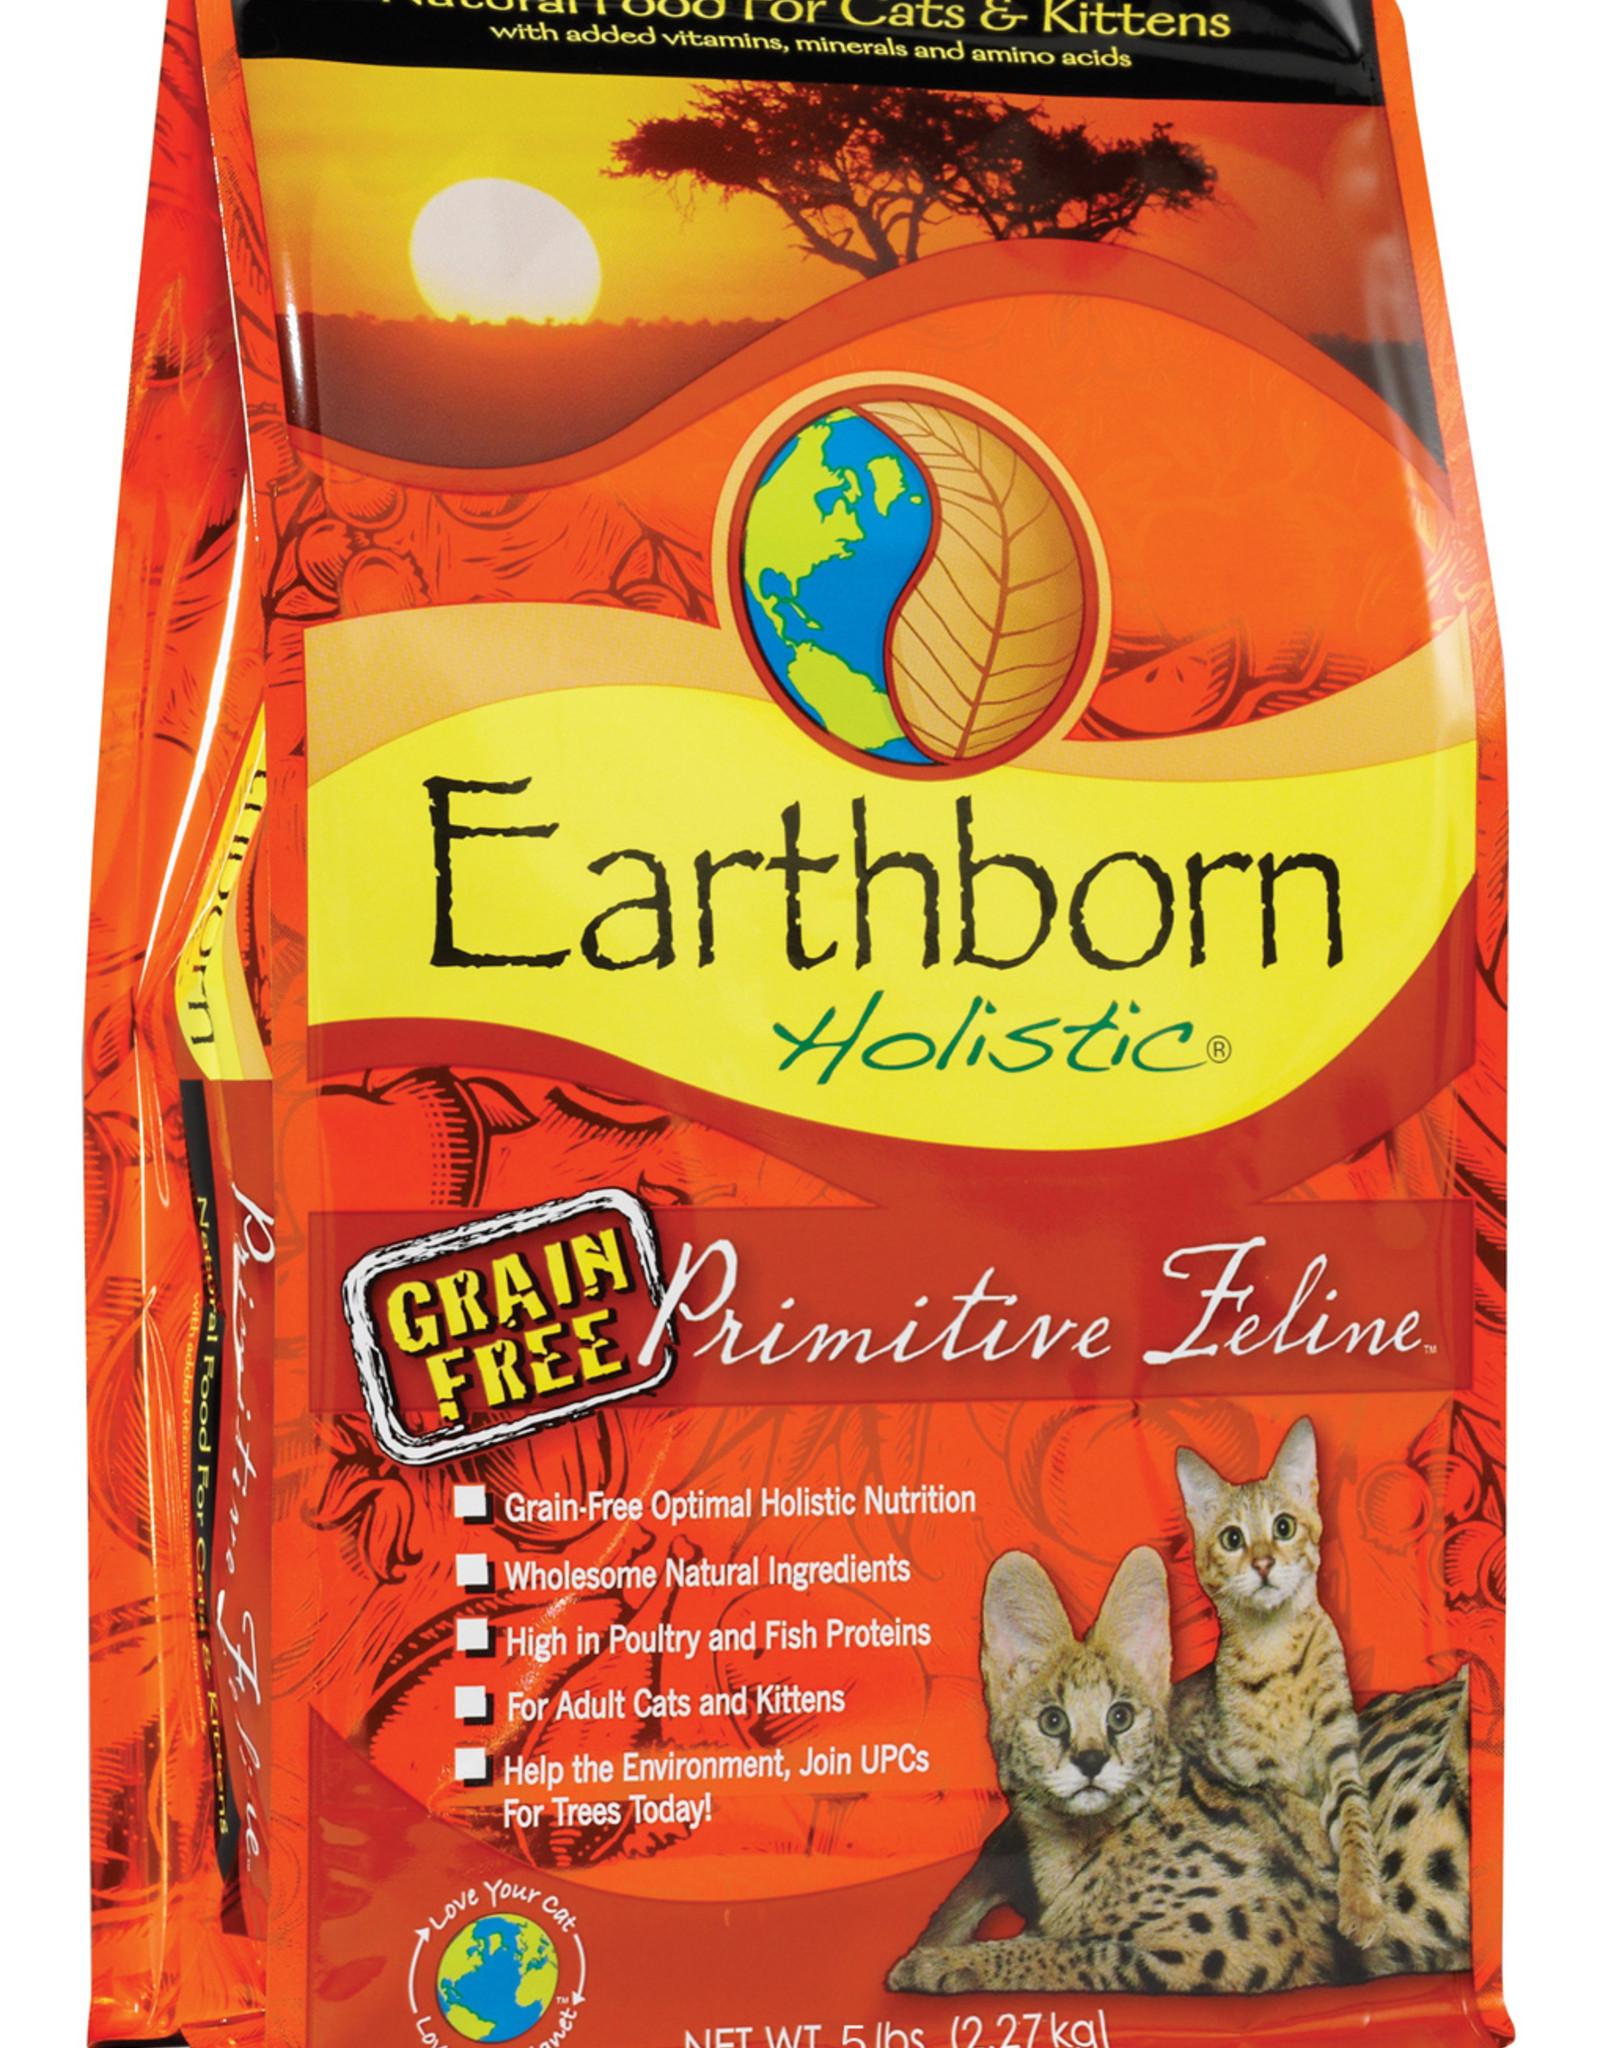 Earthborn Earthborn Holistic Cat Food Primitive Feline